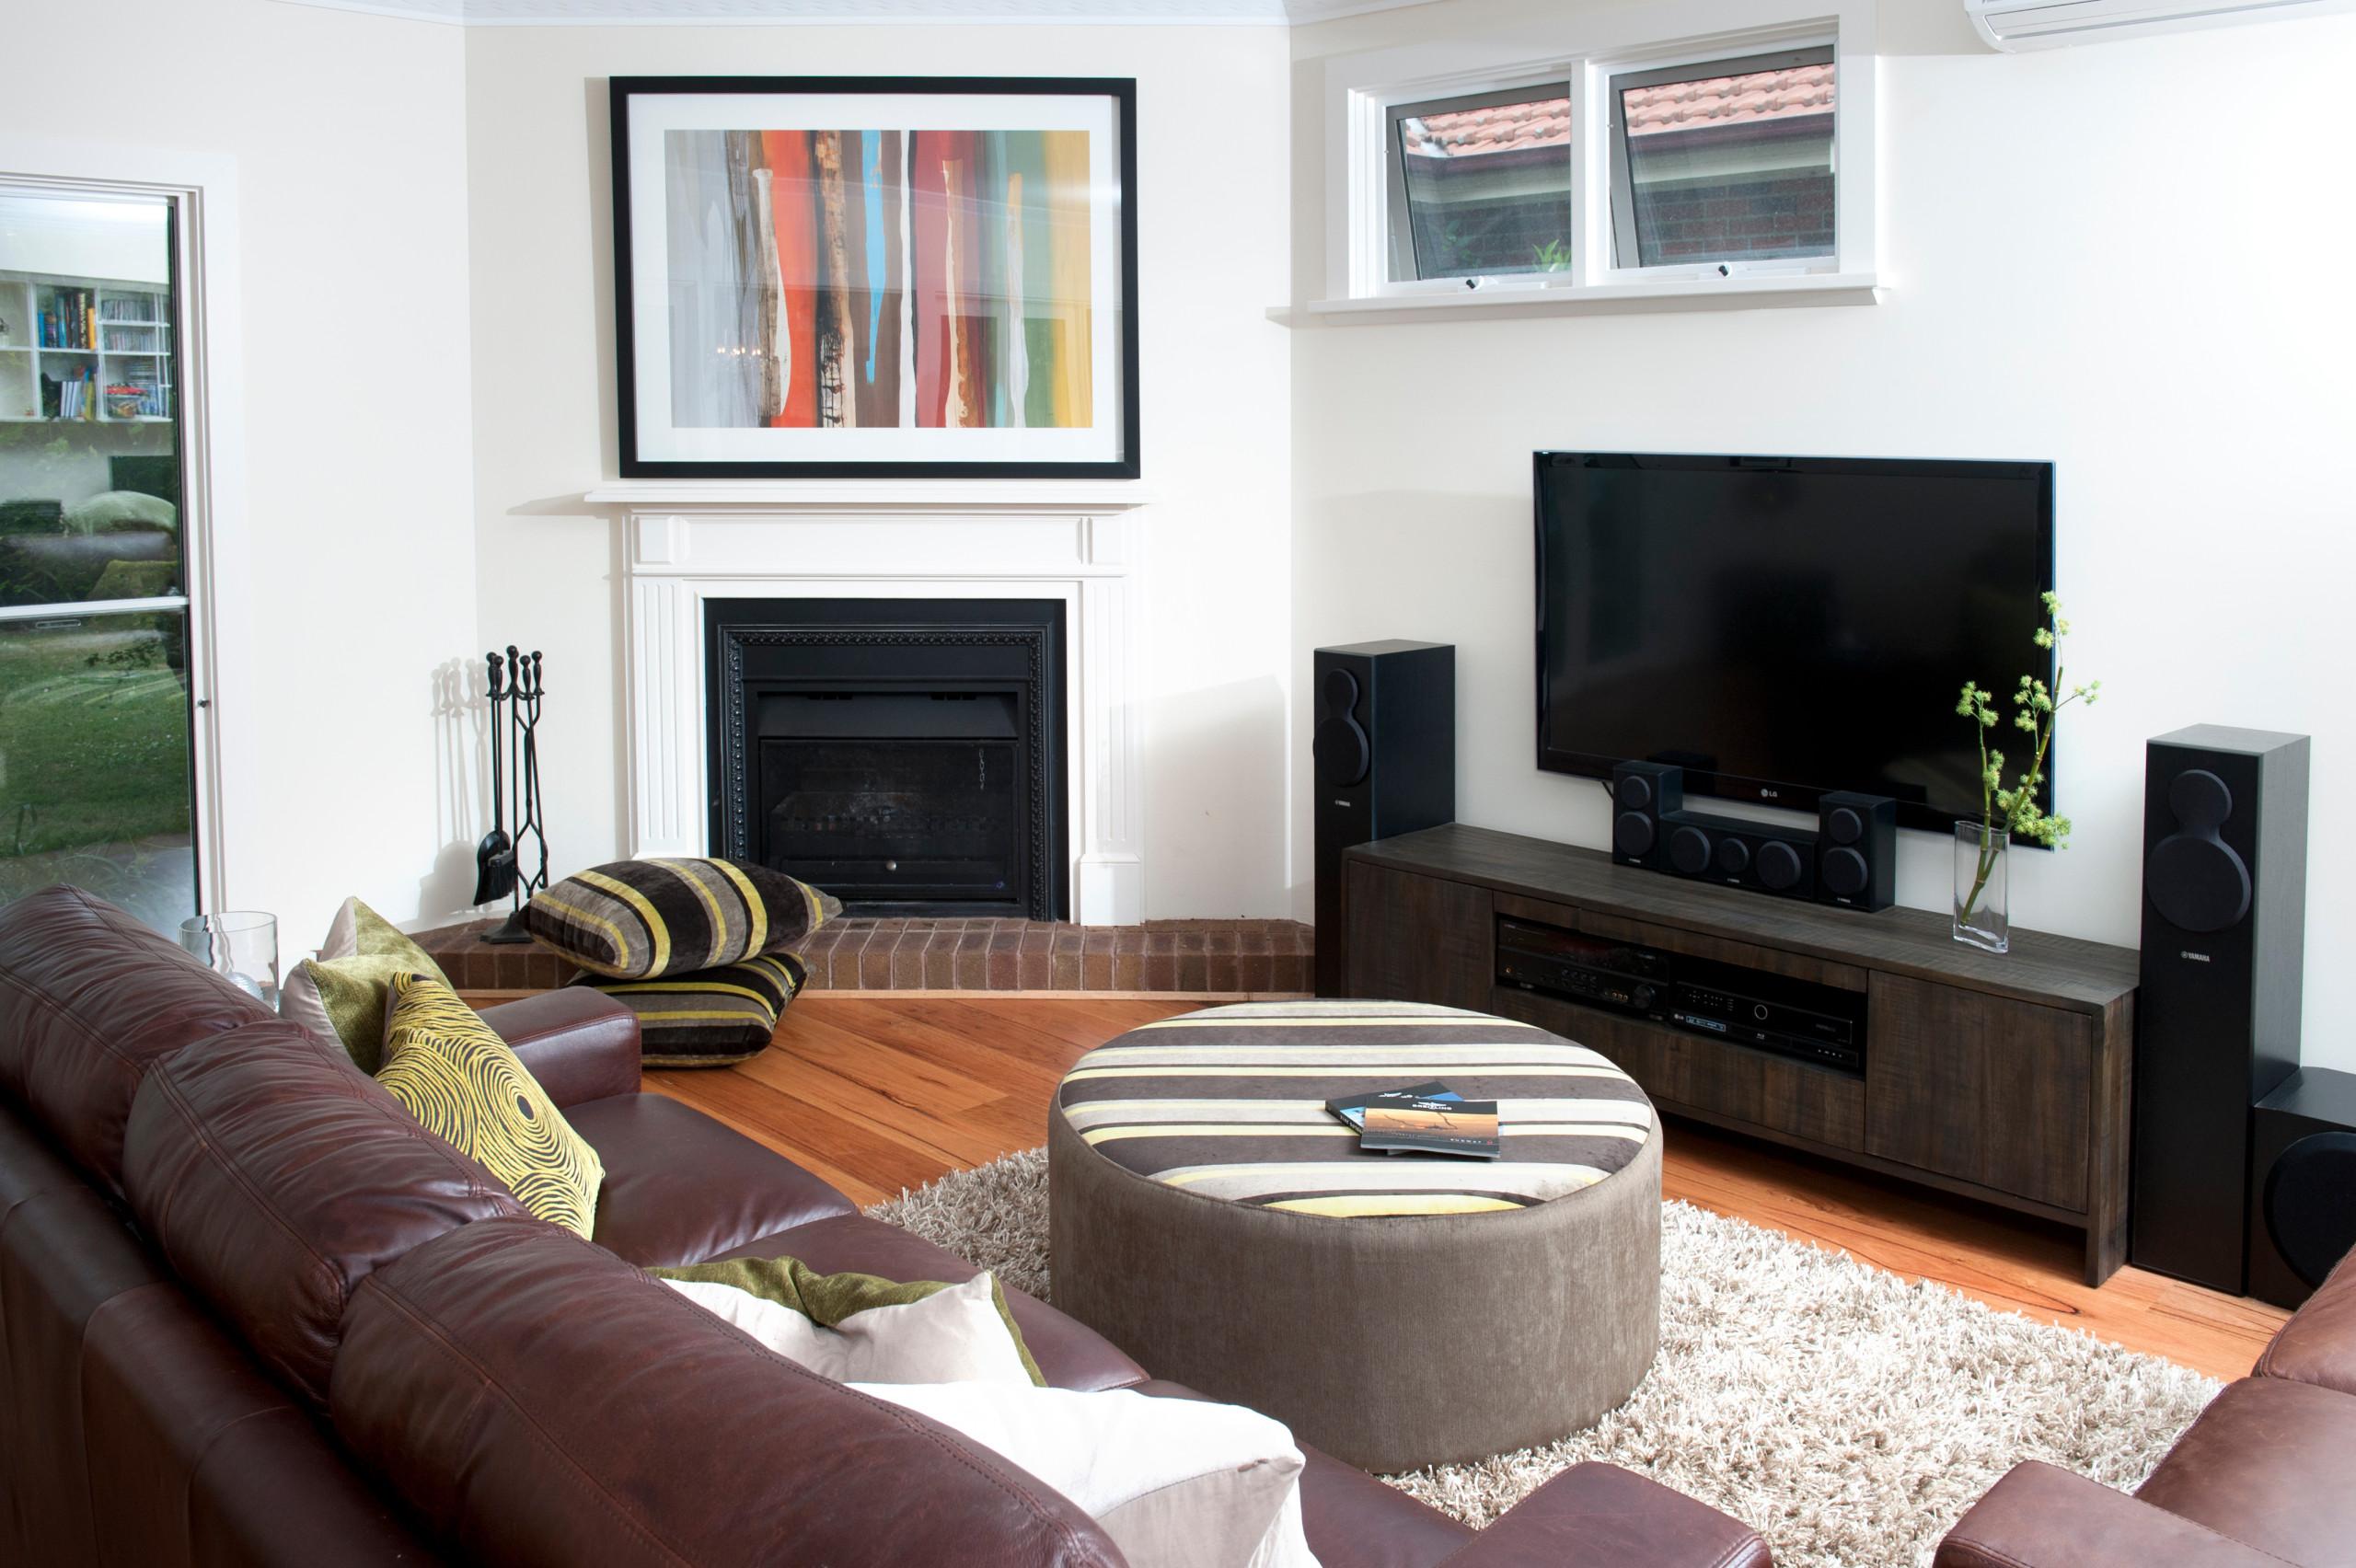 Blackburn - House Extension